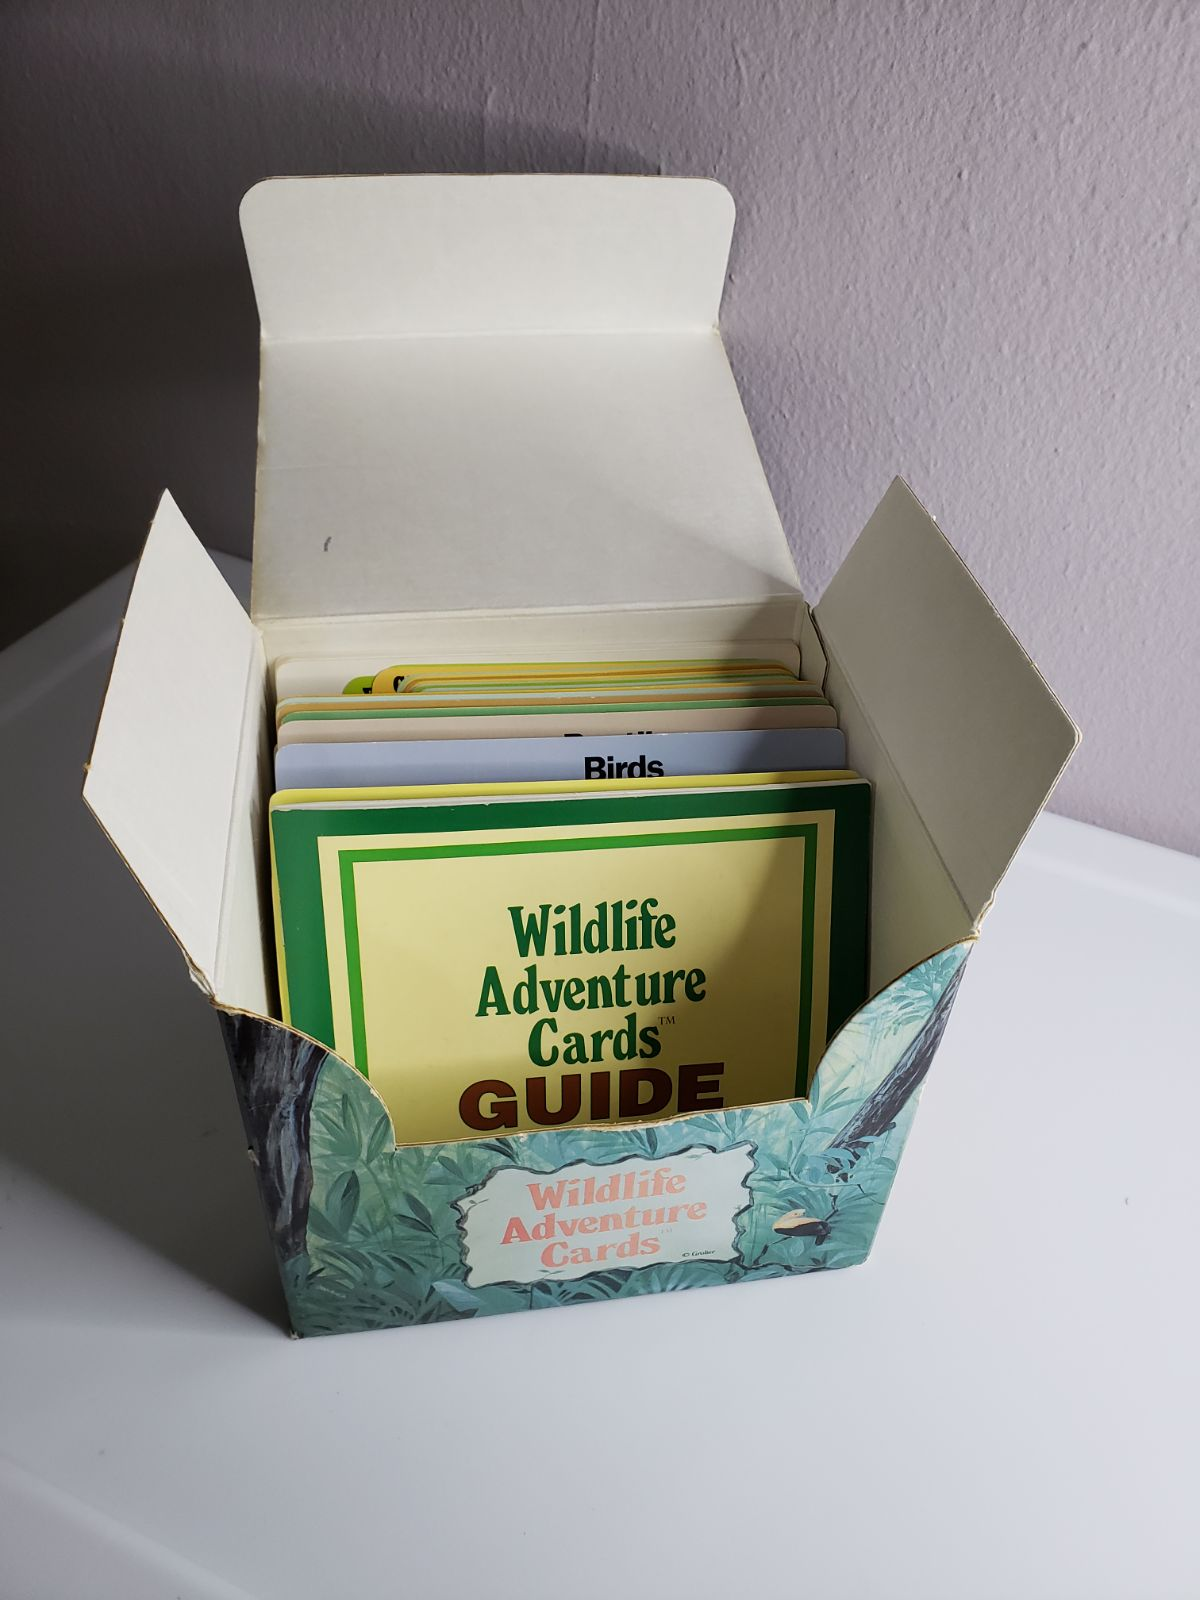 Wildlife Adventure Cards